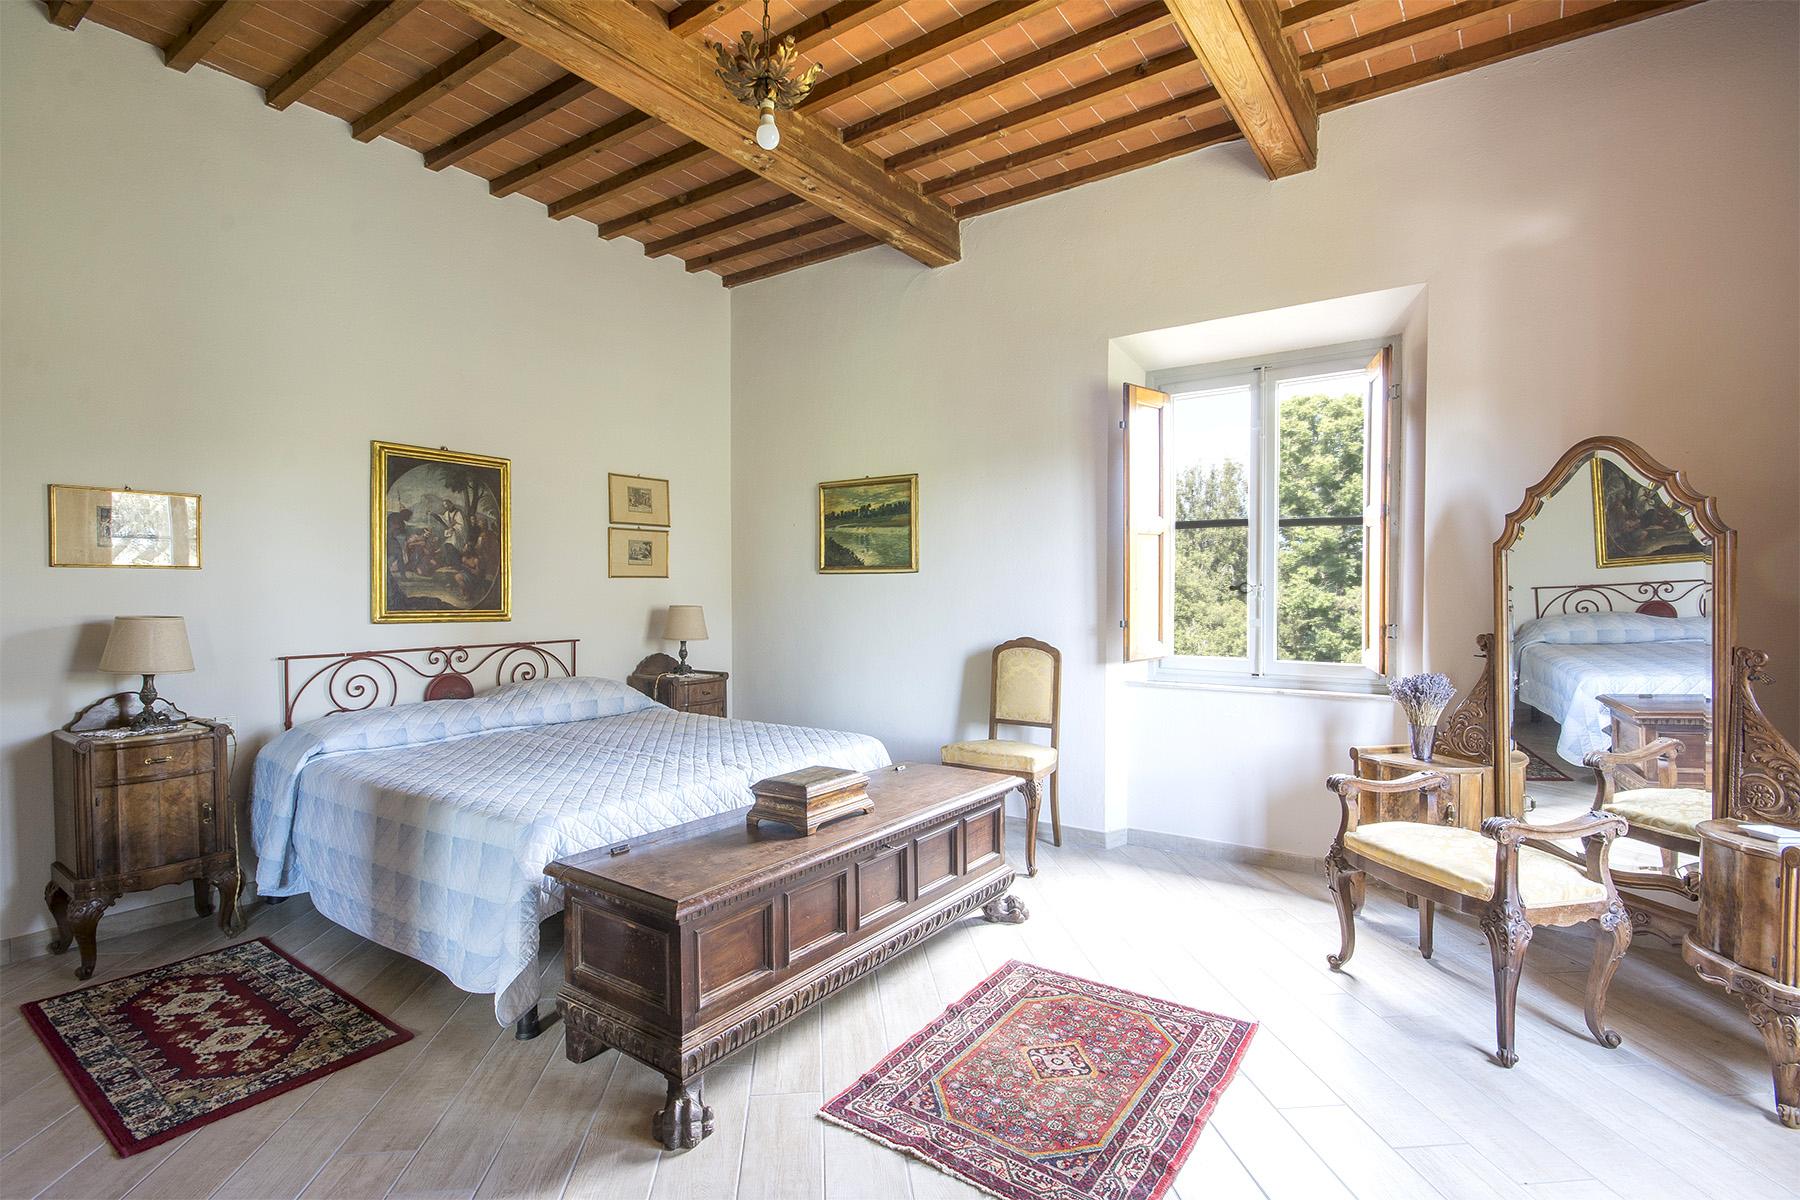 Villa in Vendita a Lucca: 5 locali, 1150 mq - Foto 10